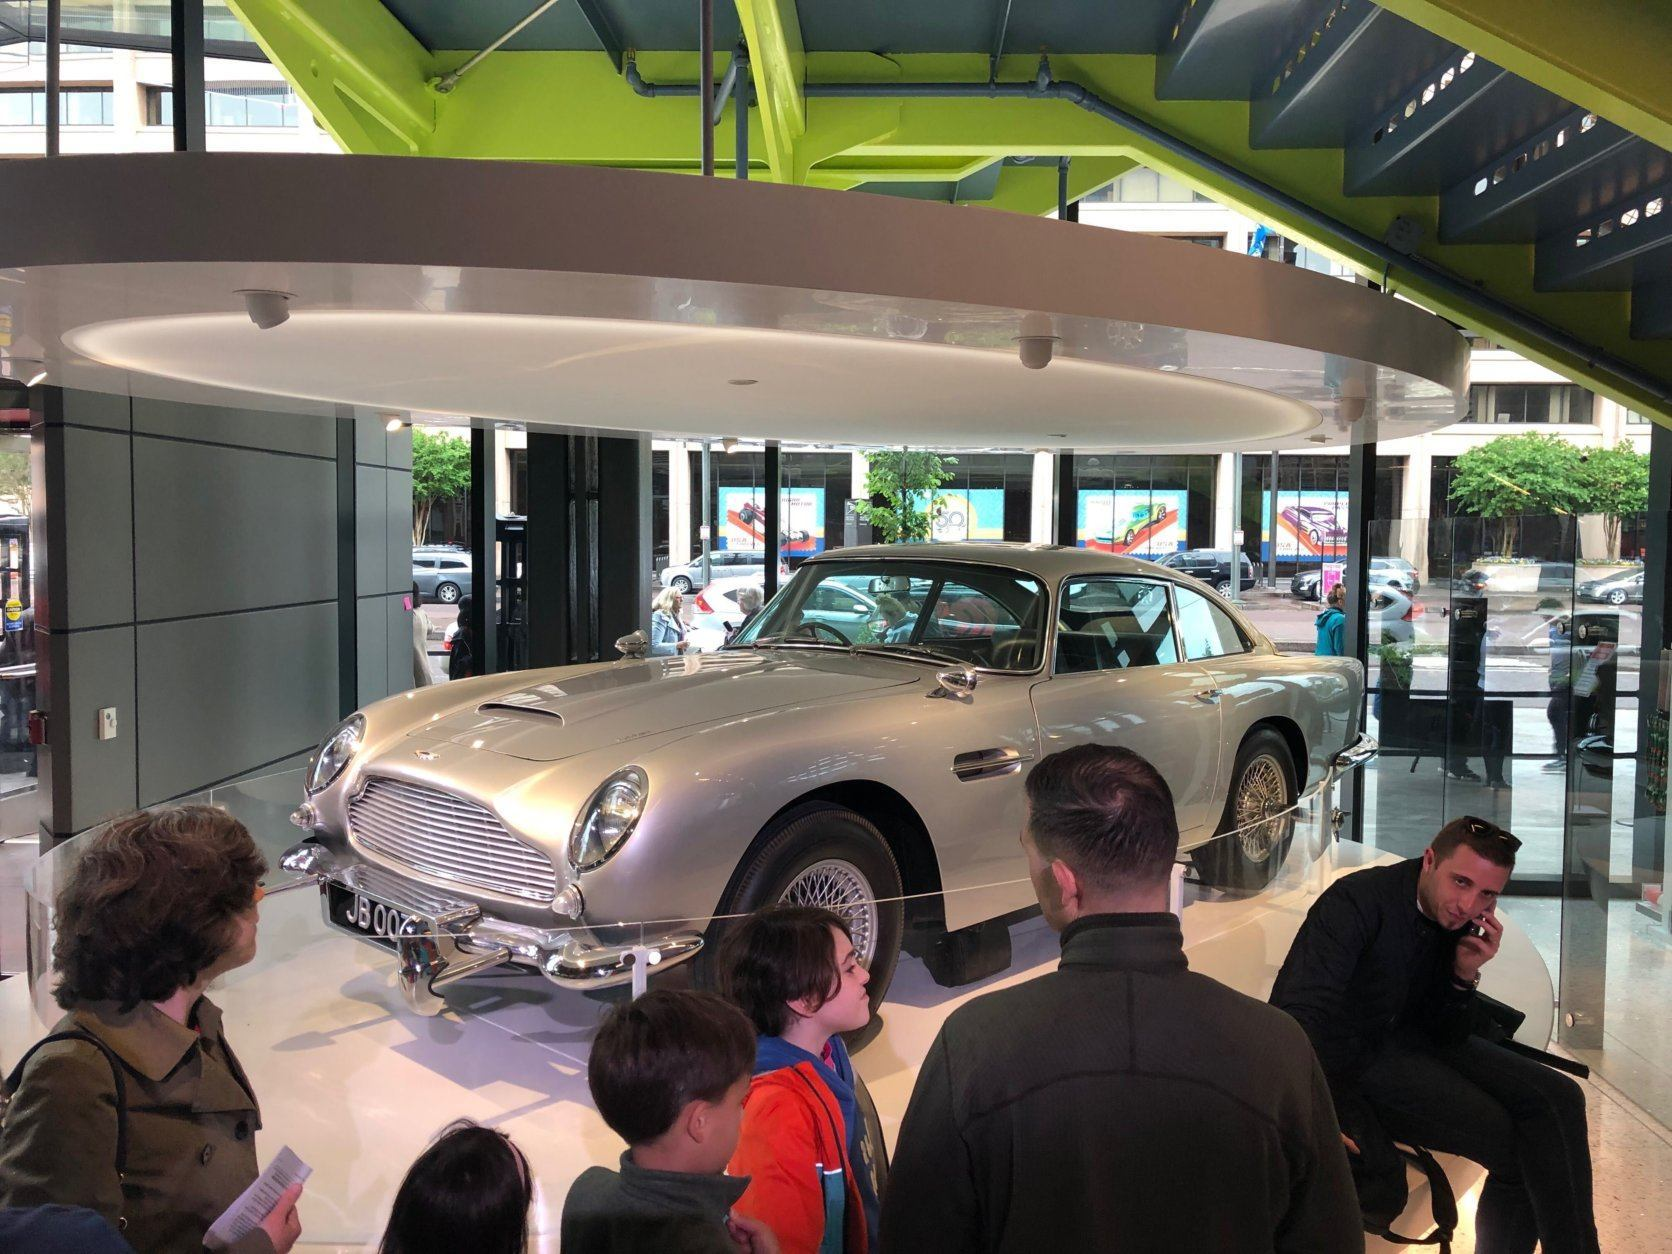 James Bond's legendary Aston Martin  DB5 on display at the International Spy Museum. (WTOP/Keara Dowd)